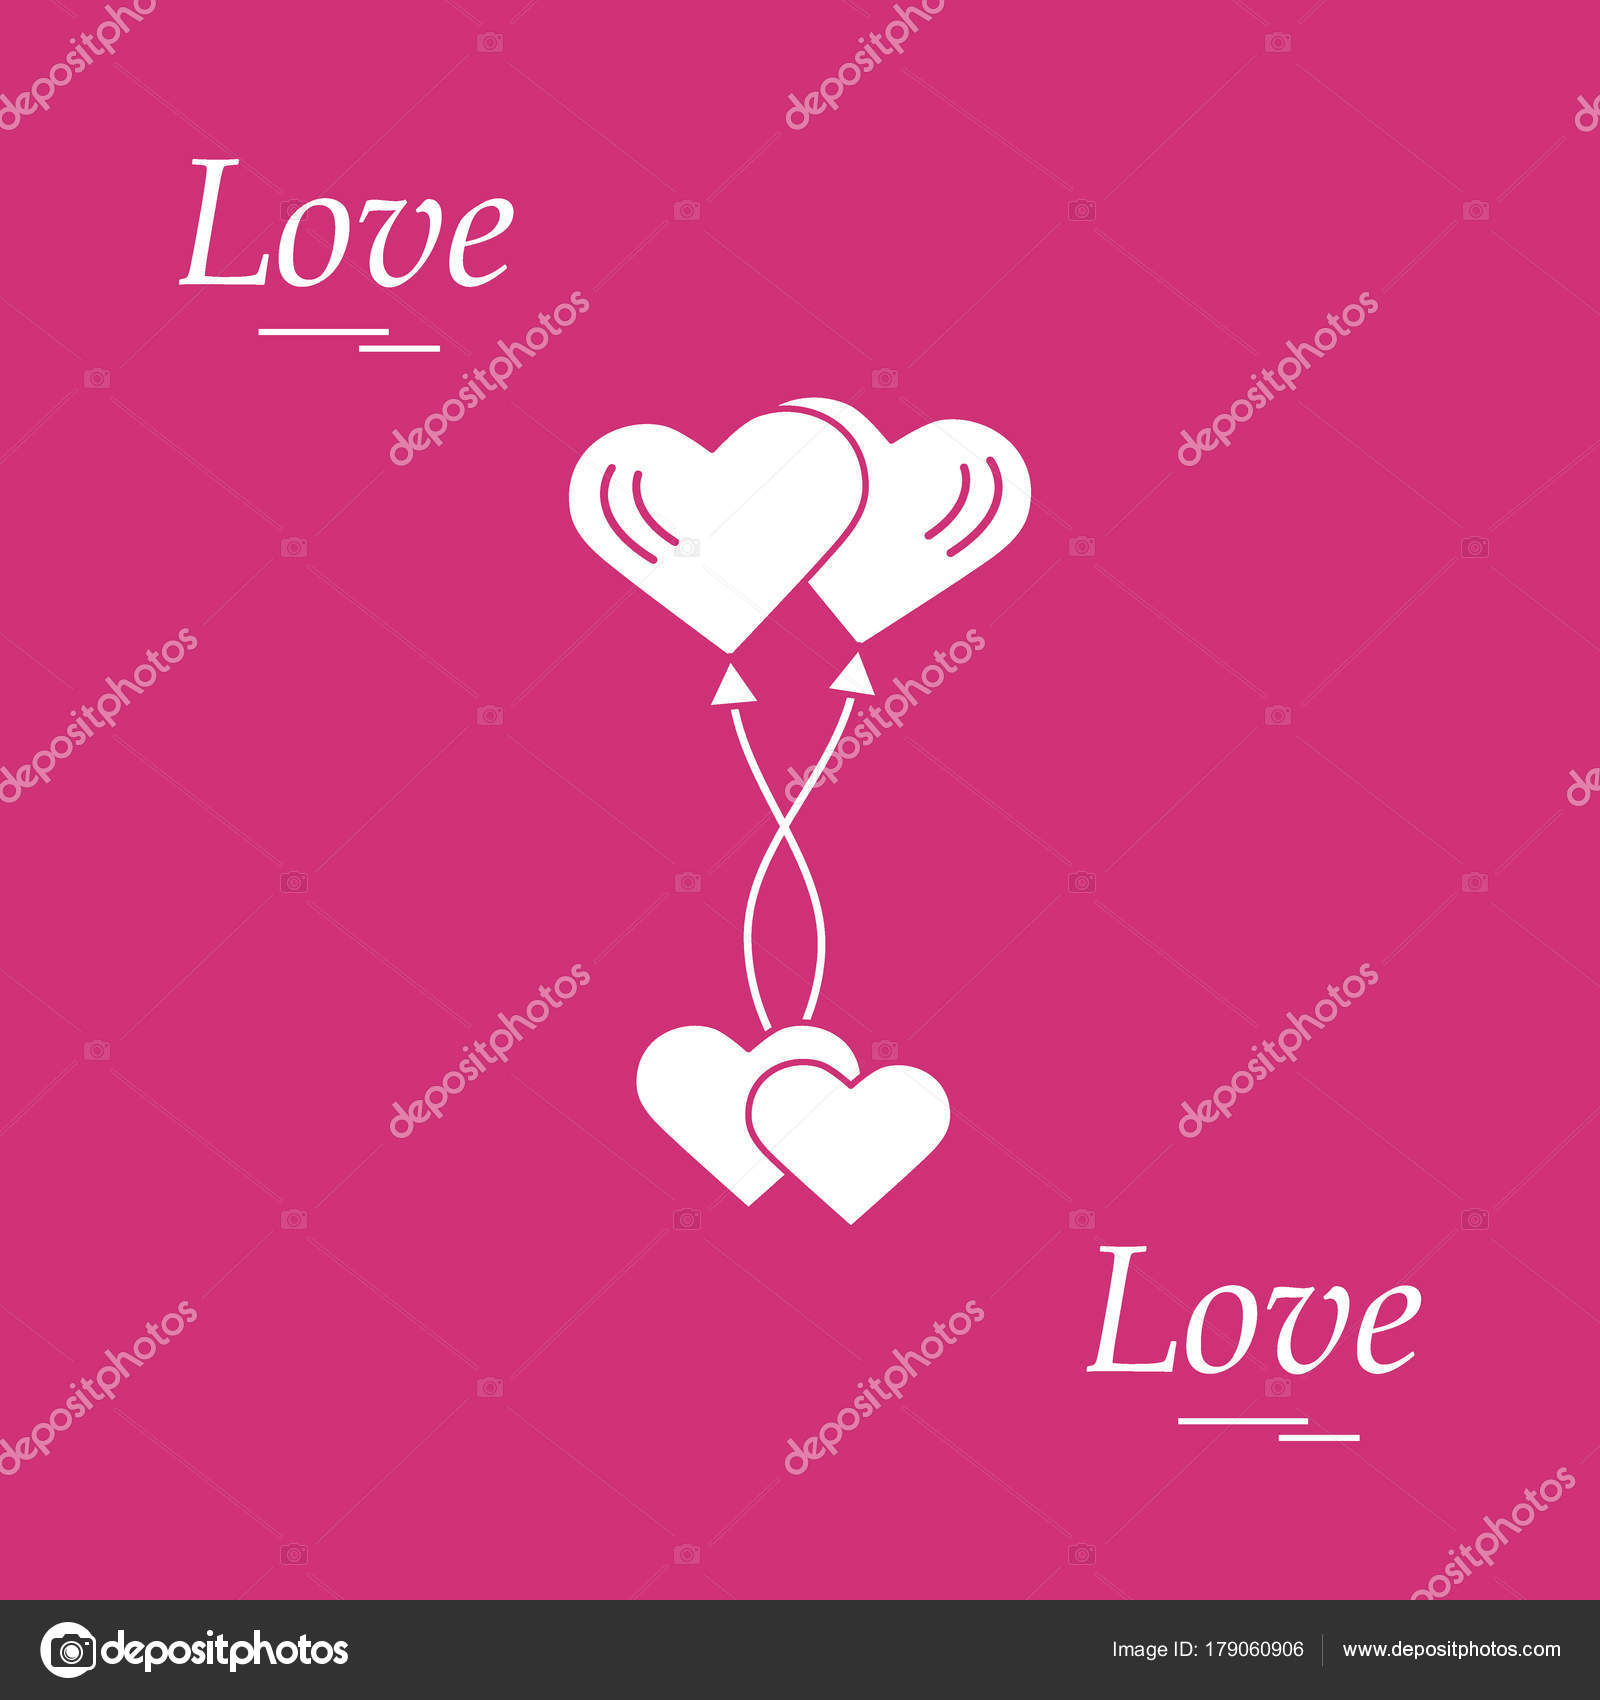 Cute Vector Illustration Of Love Symbols Heart Air Balloons Ico